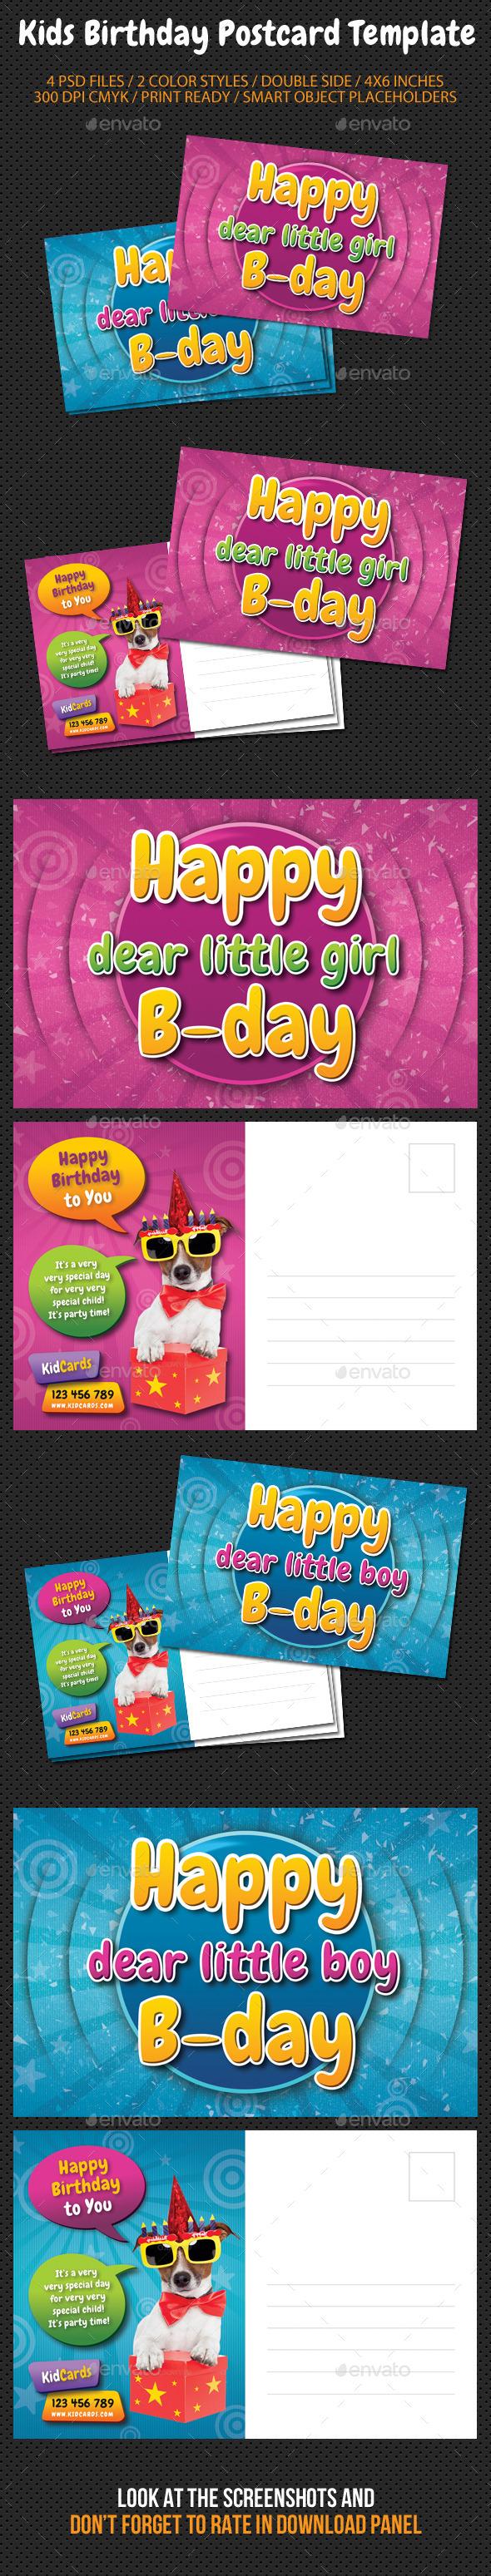 Kids Birthday Postcard Template - Birthday Greeting Cards